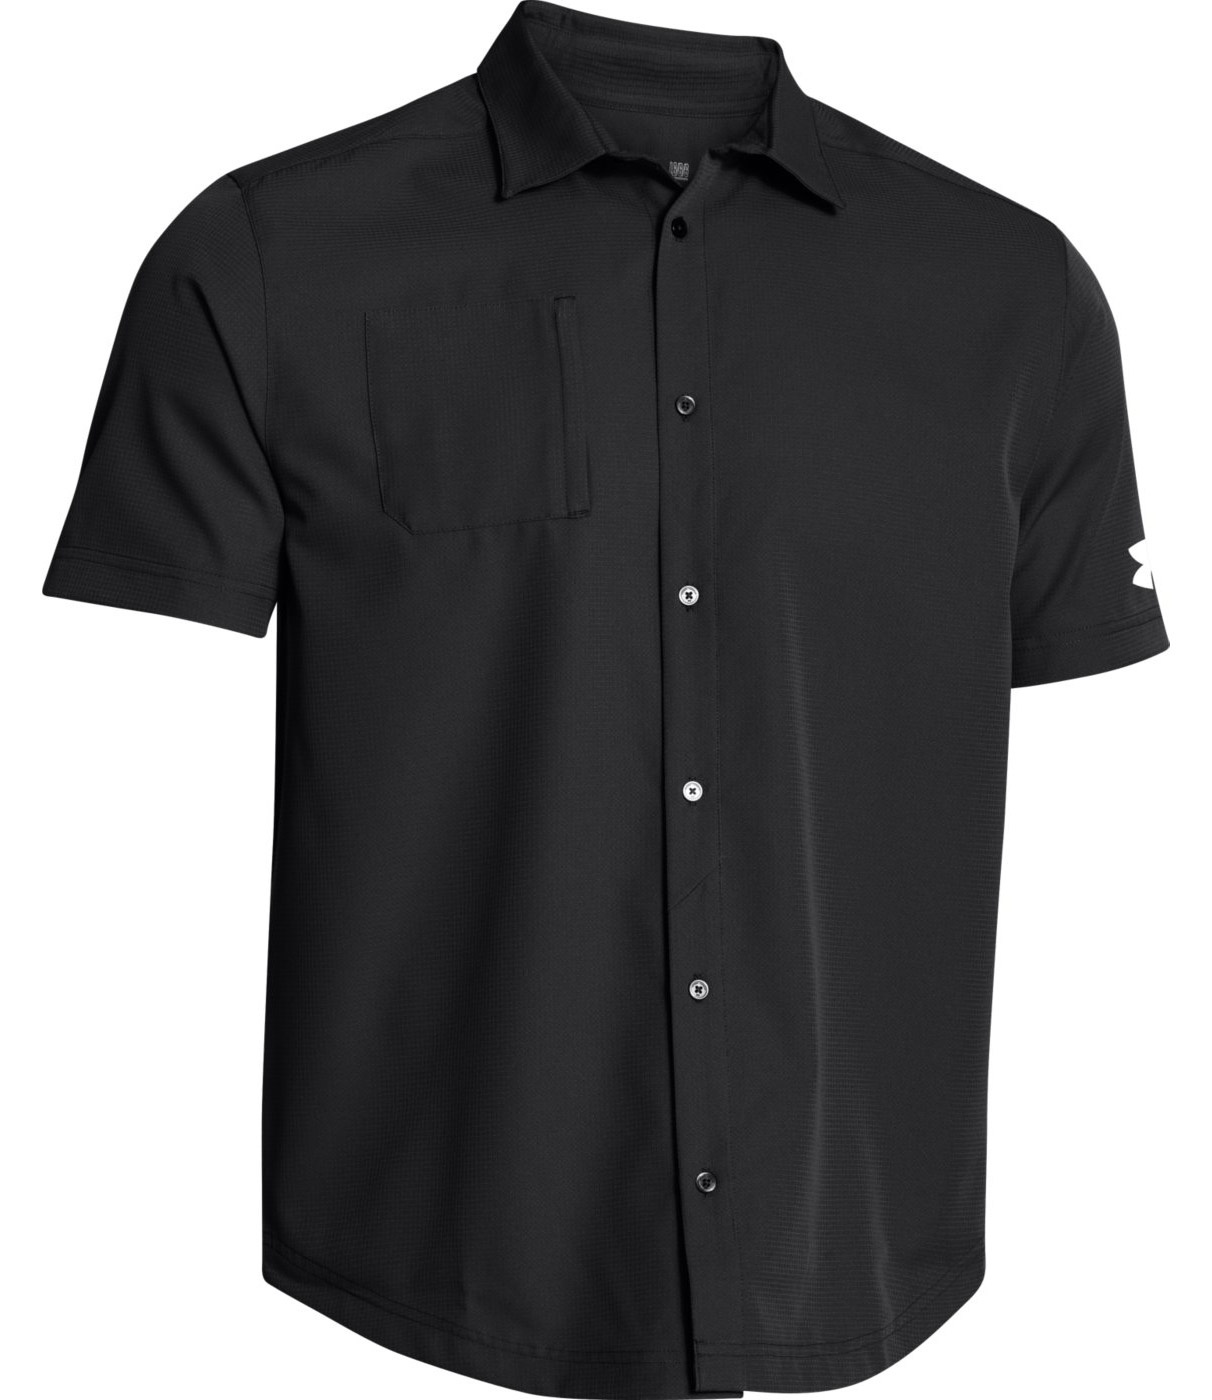 Under armour ultimate men 39 s button down short sleeve shirt for Button down shirts for short men